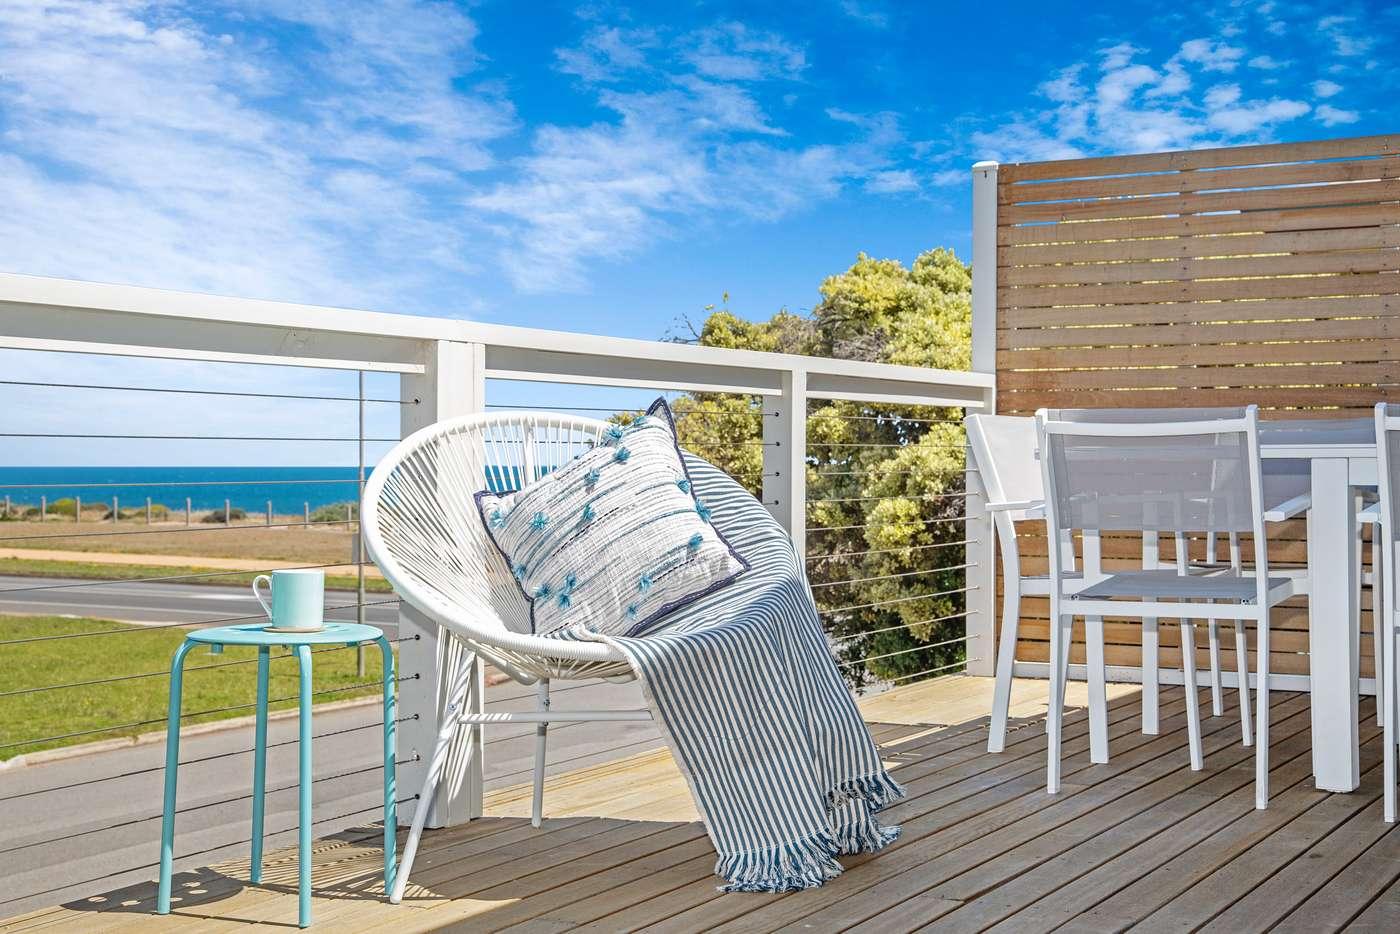 Main view of Homely house listing, 3 Hamilton Avenue, Aldinga Beach SA 5173